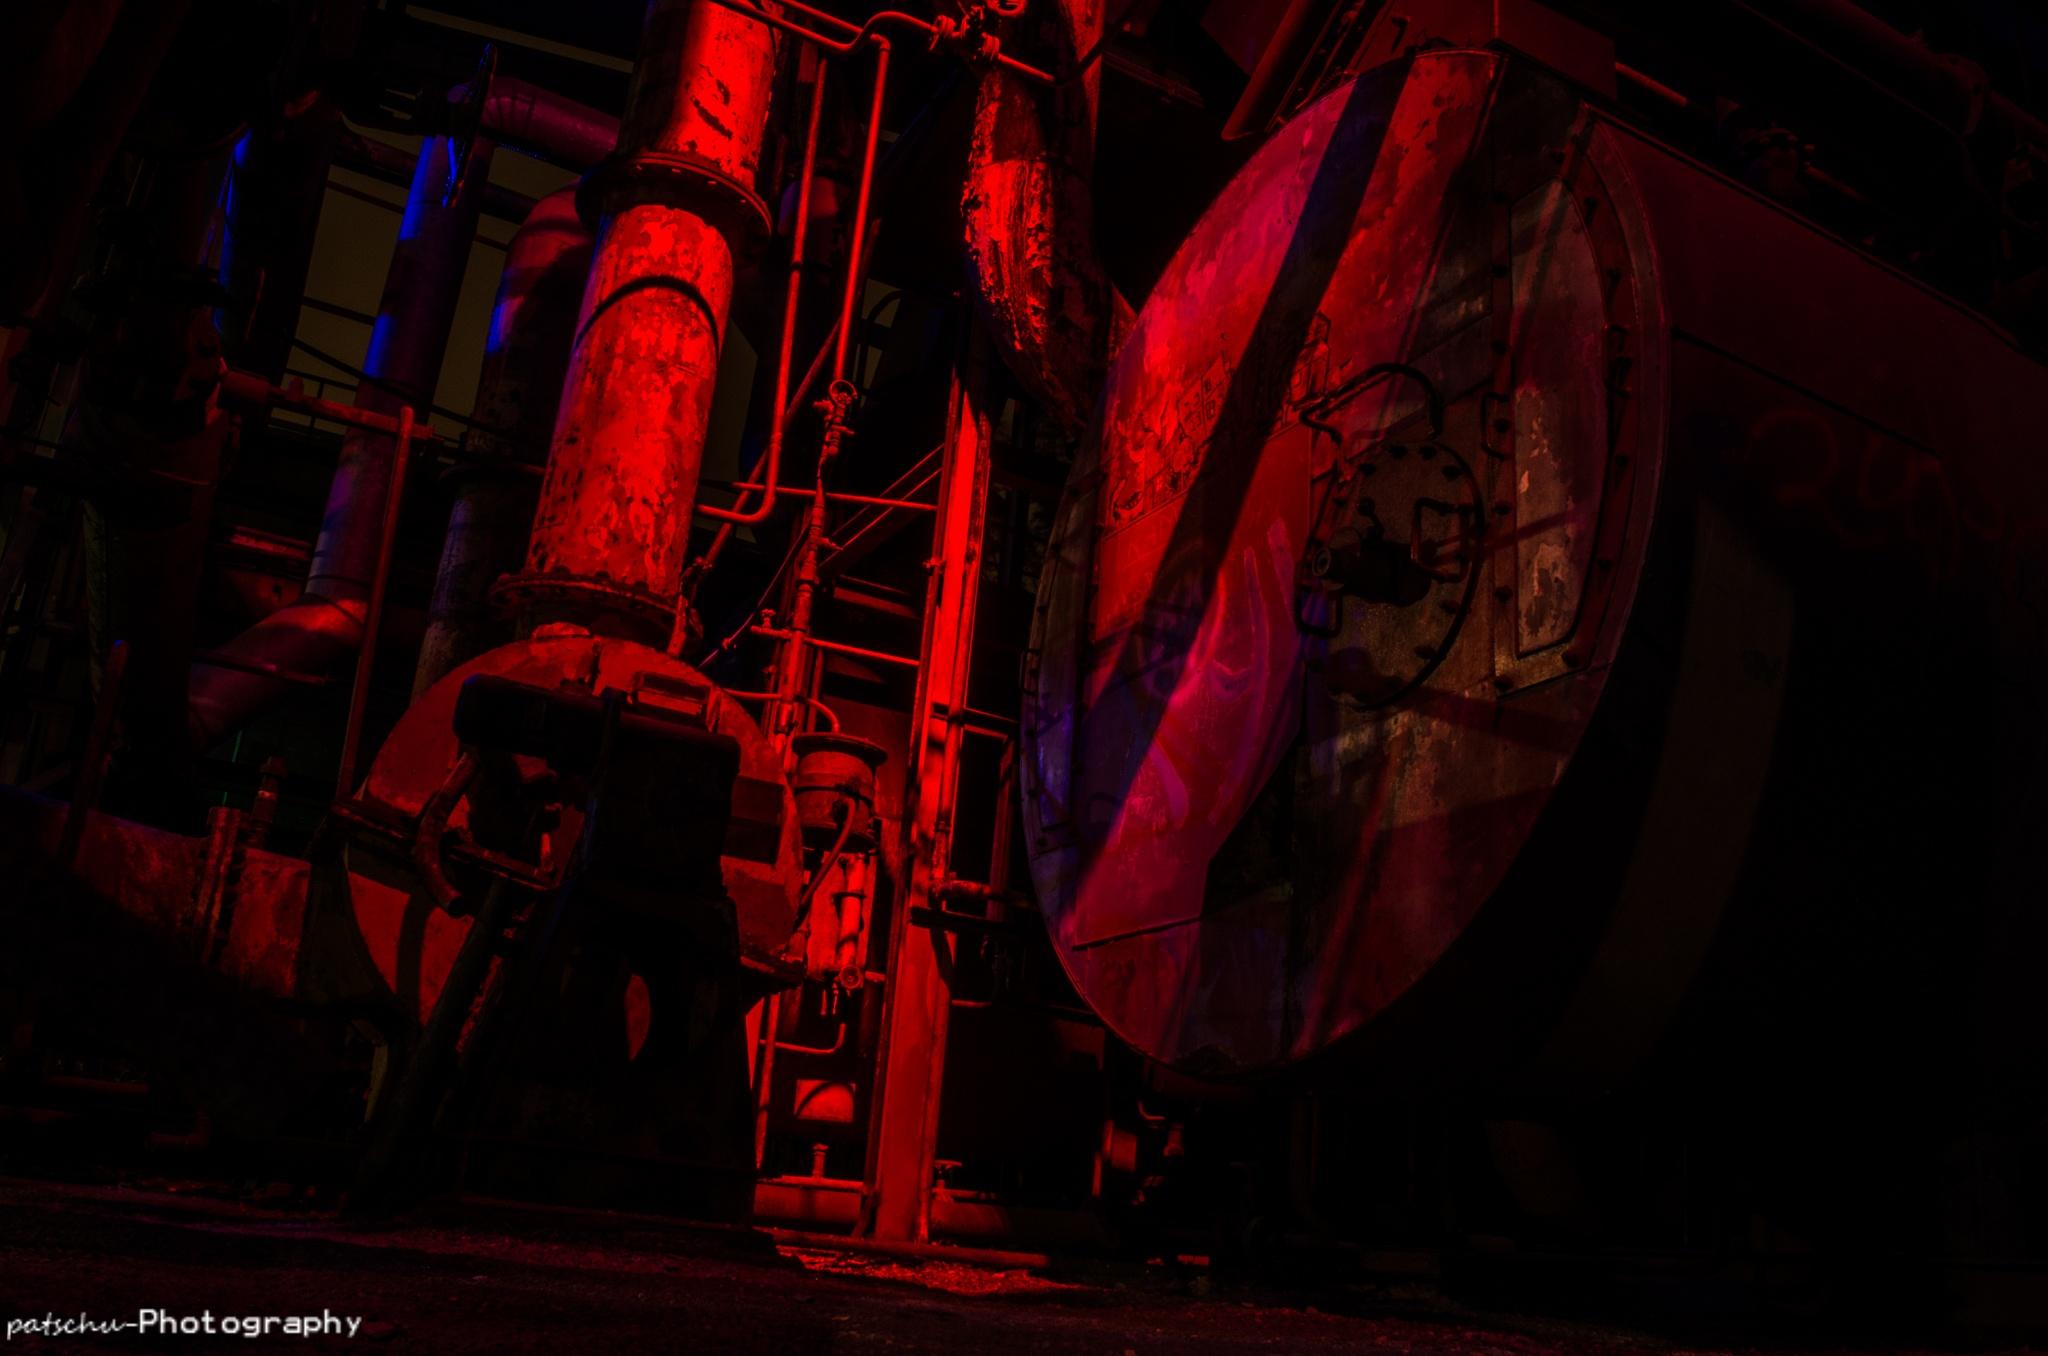 Red by Patrick Schubert